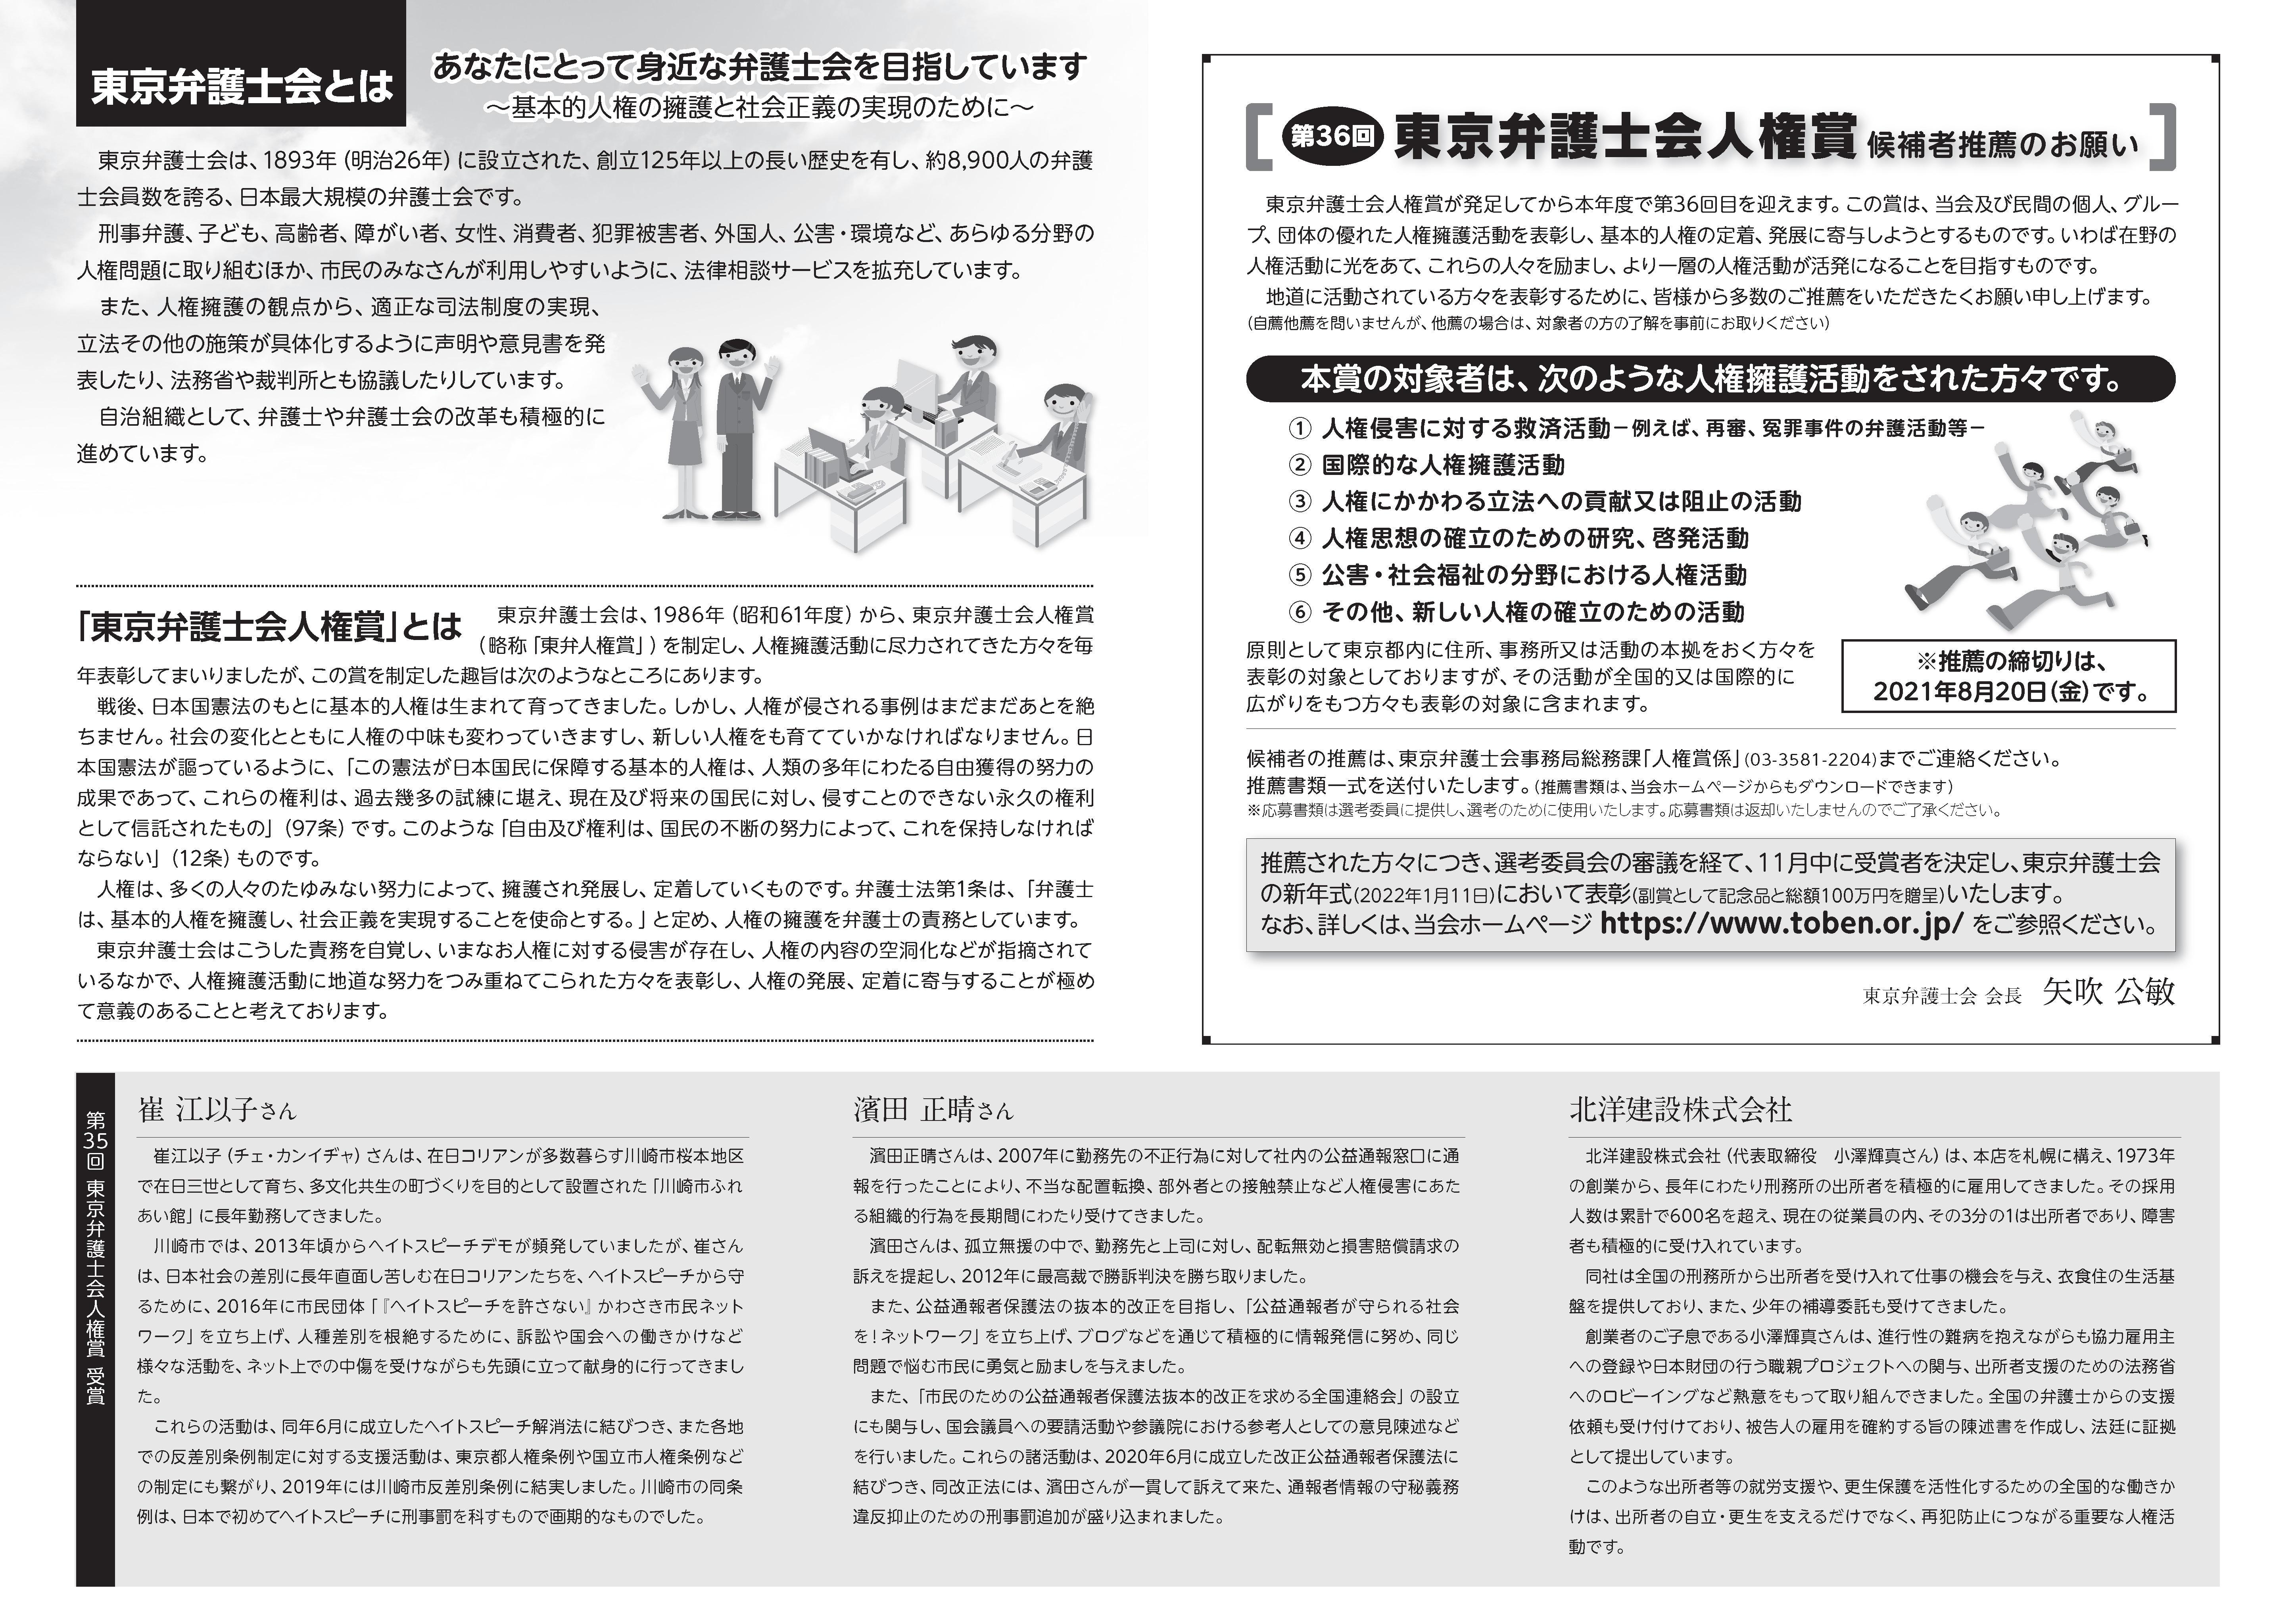 2021_tobenjinkenshou_pamphlet2.jpg